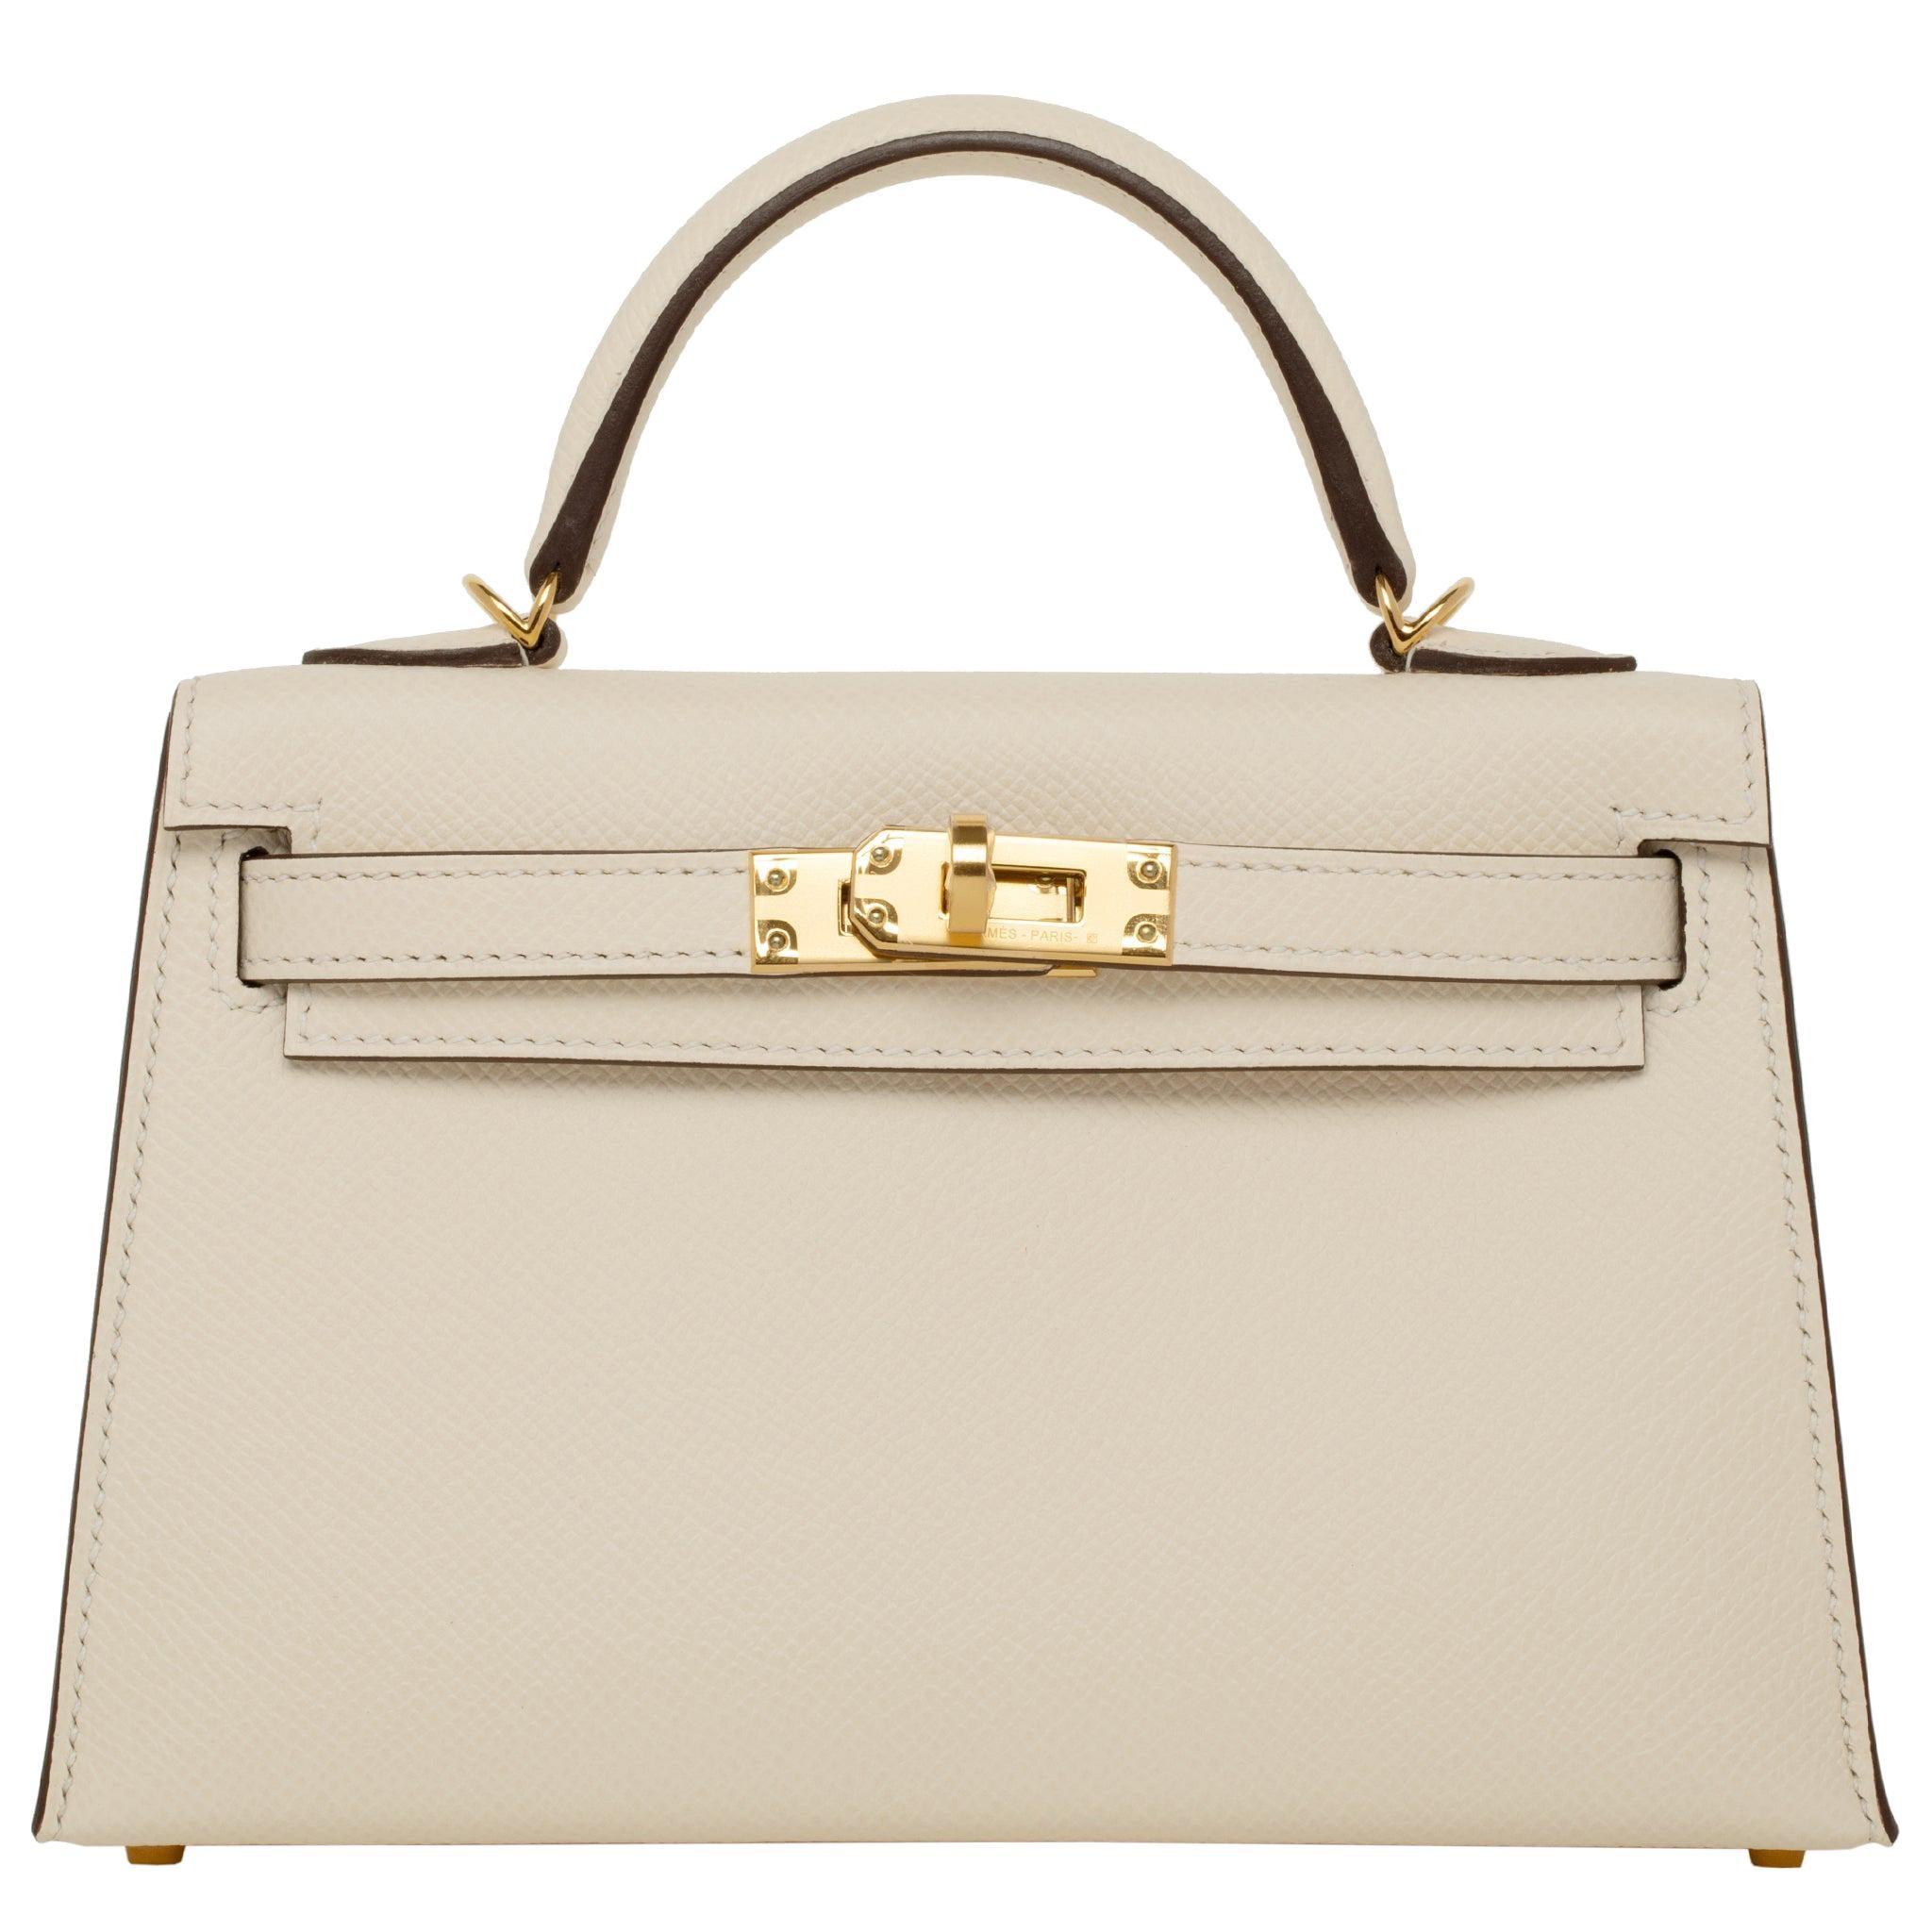 Hermès Mini Kelly II Nata Epsom Leather Gold Hardware